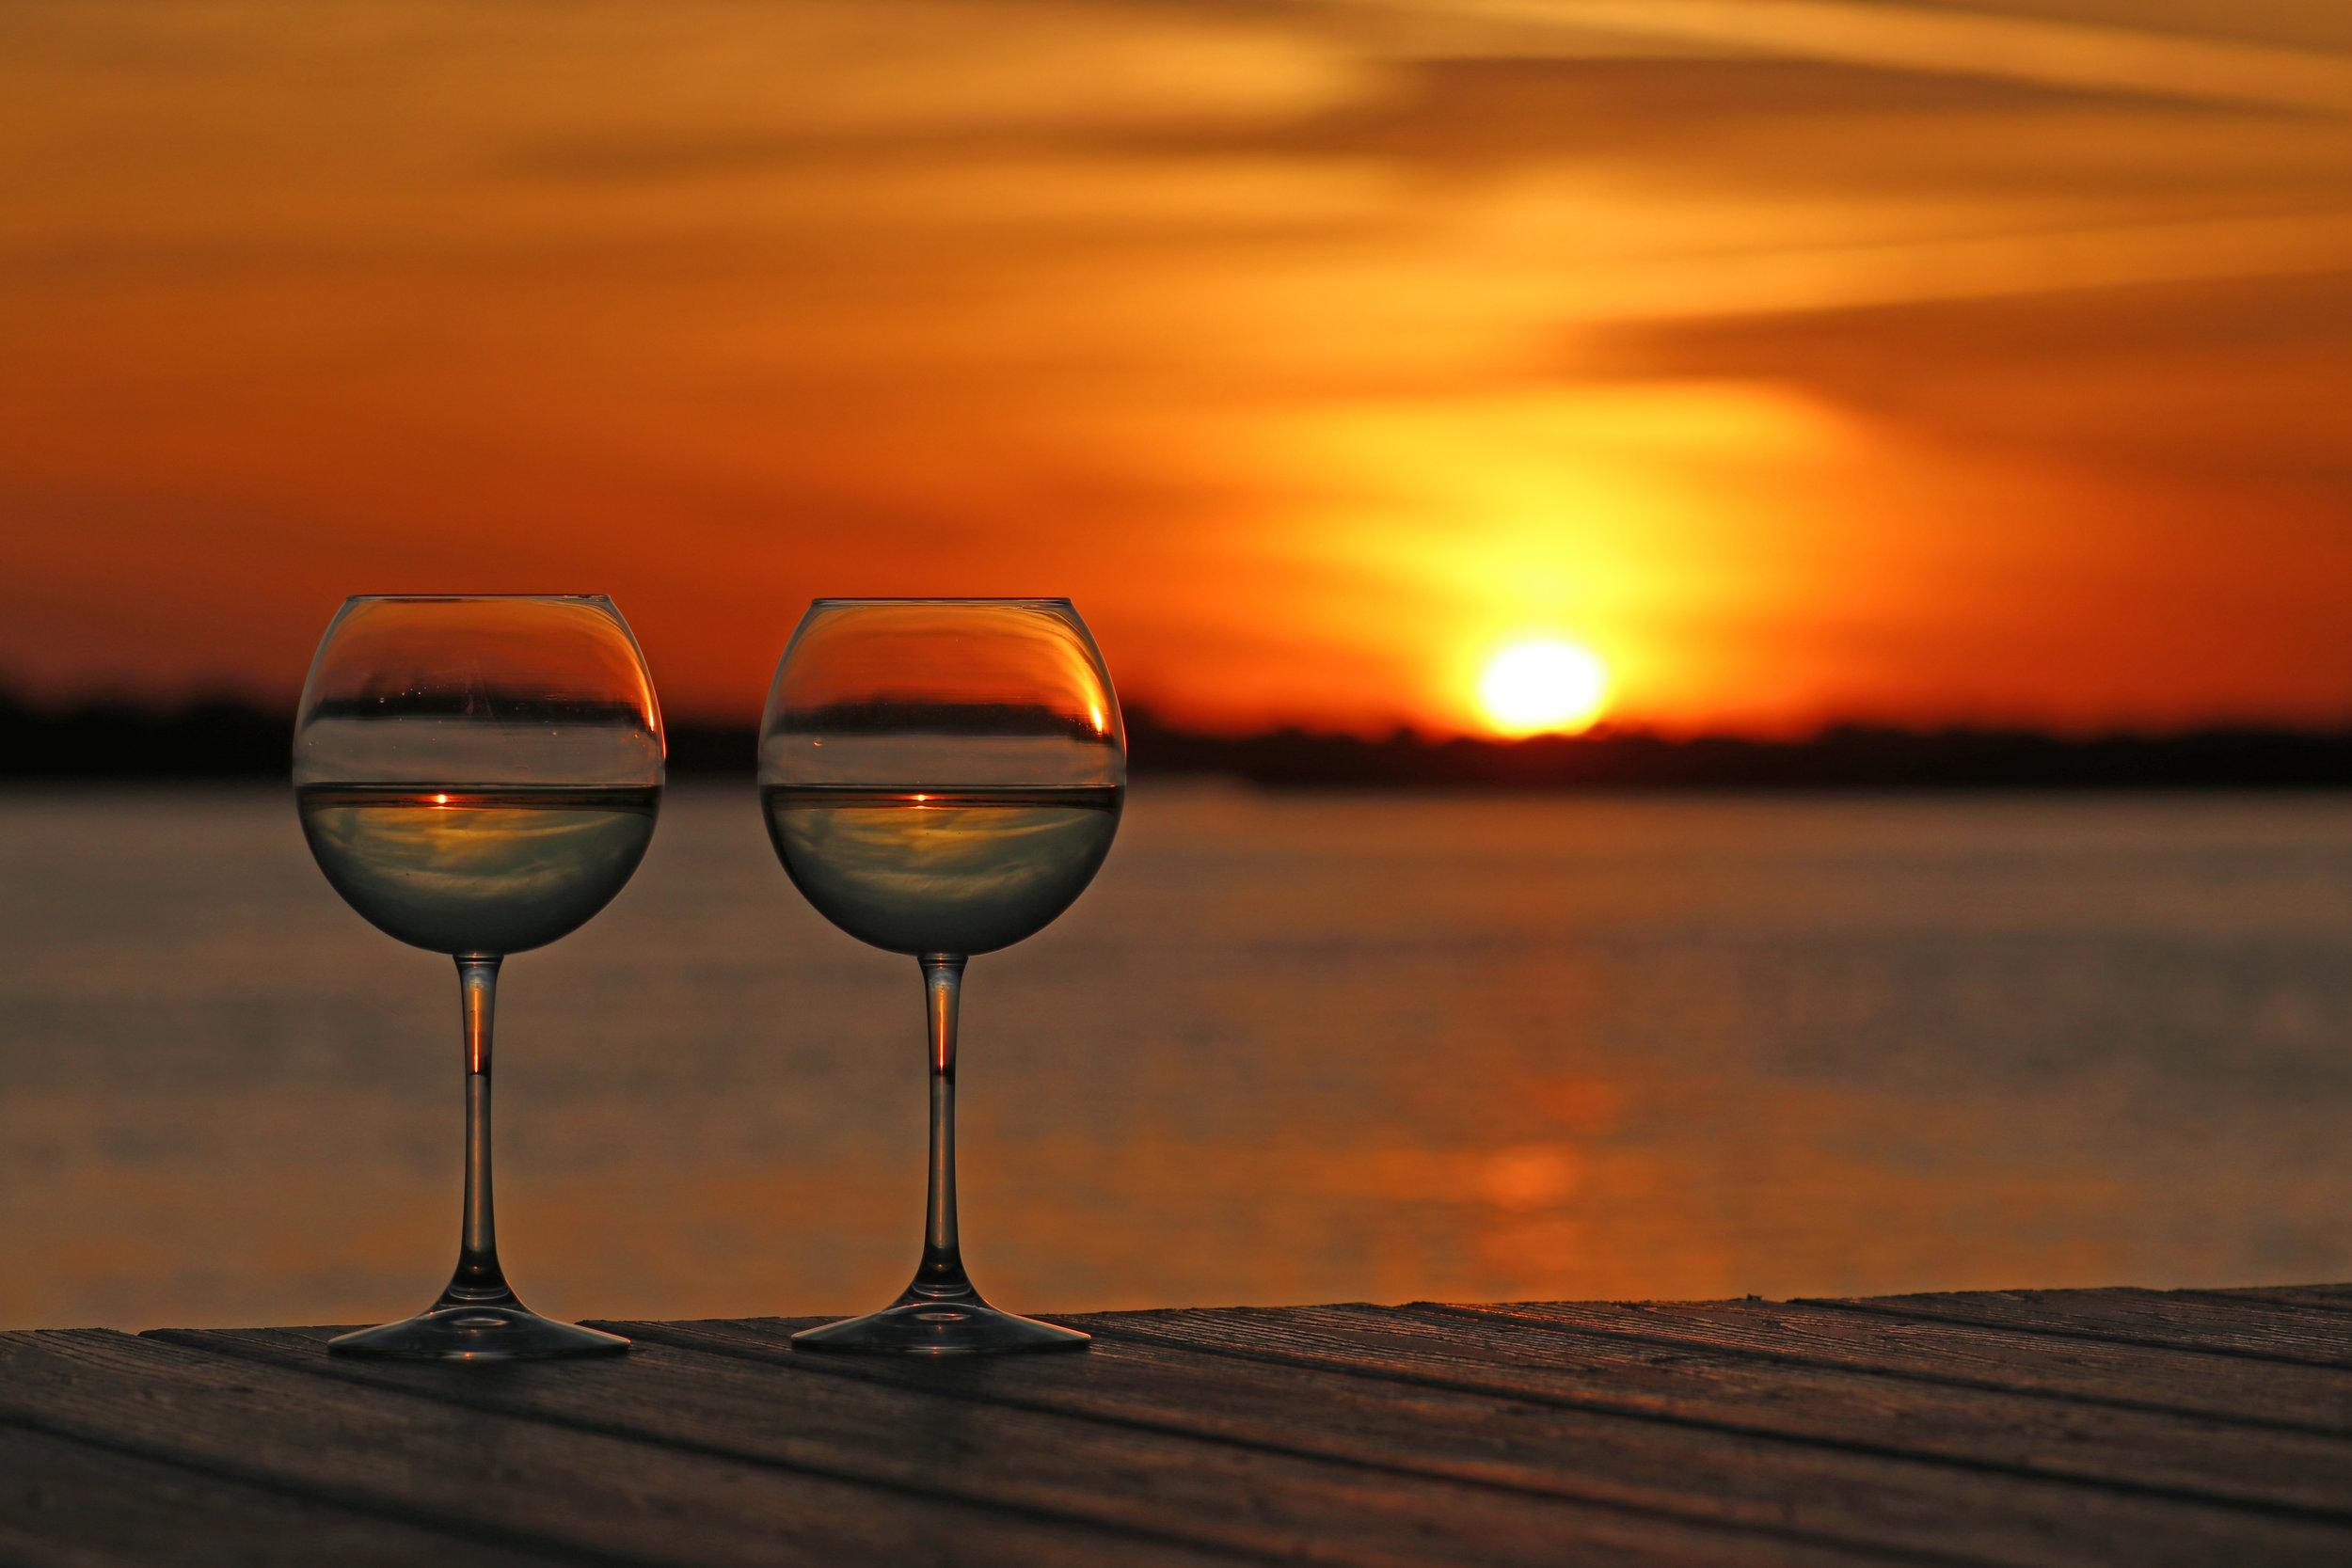 Vino at sunset